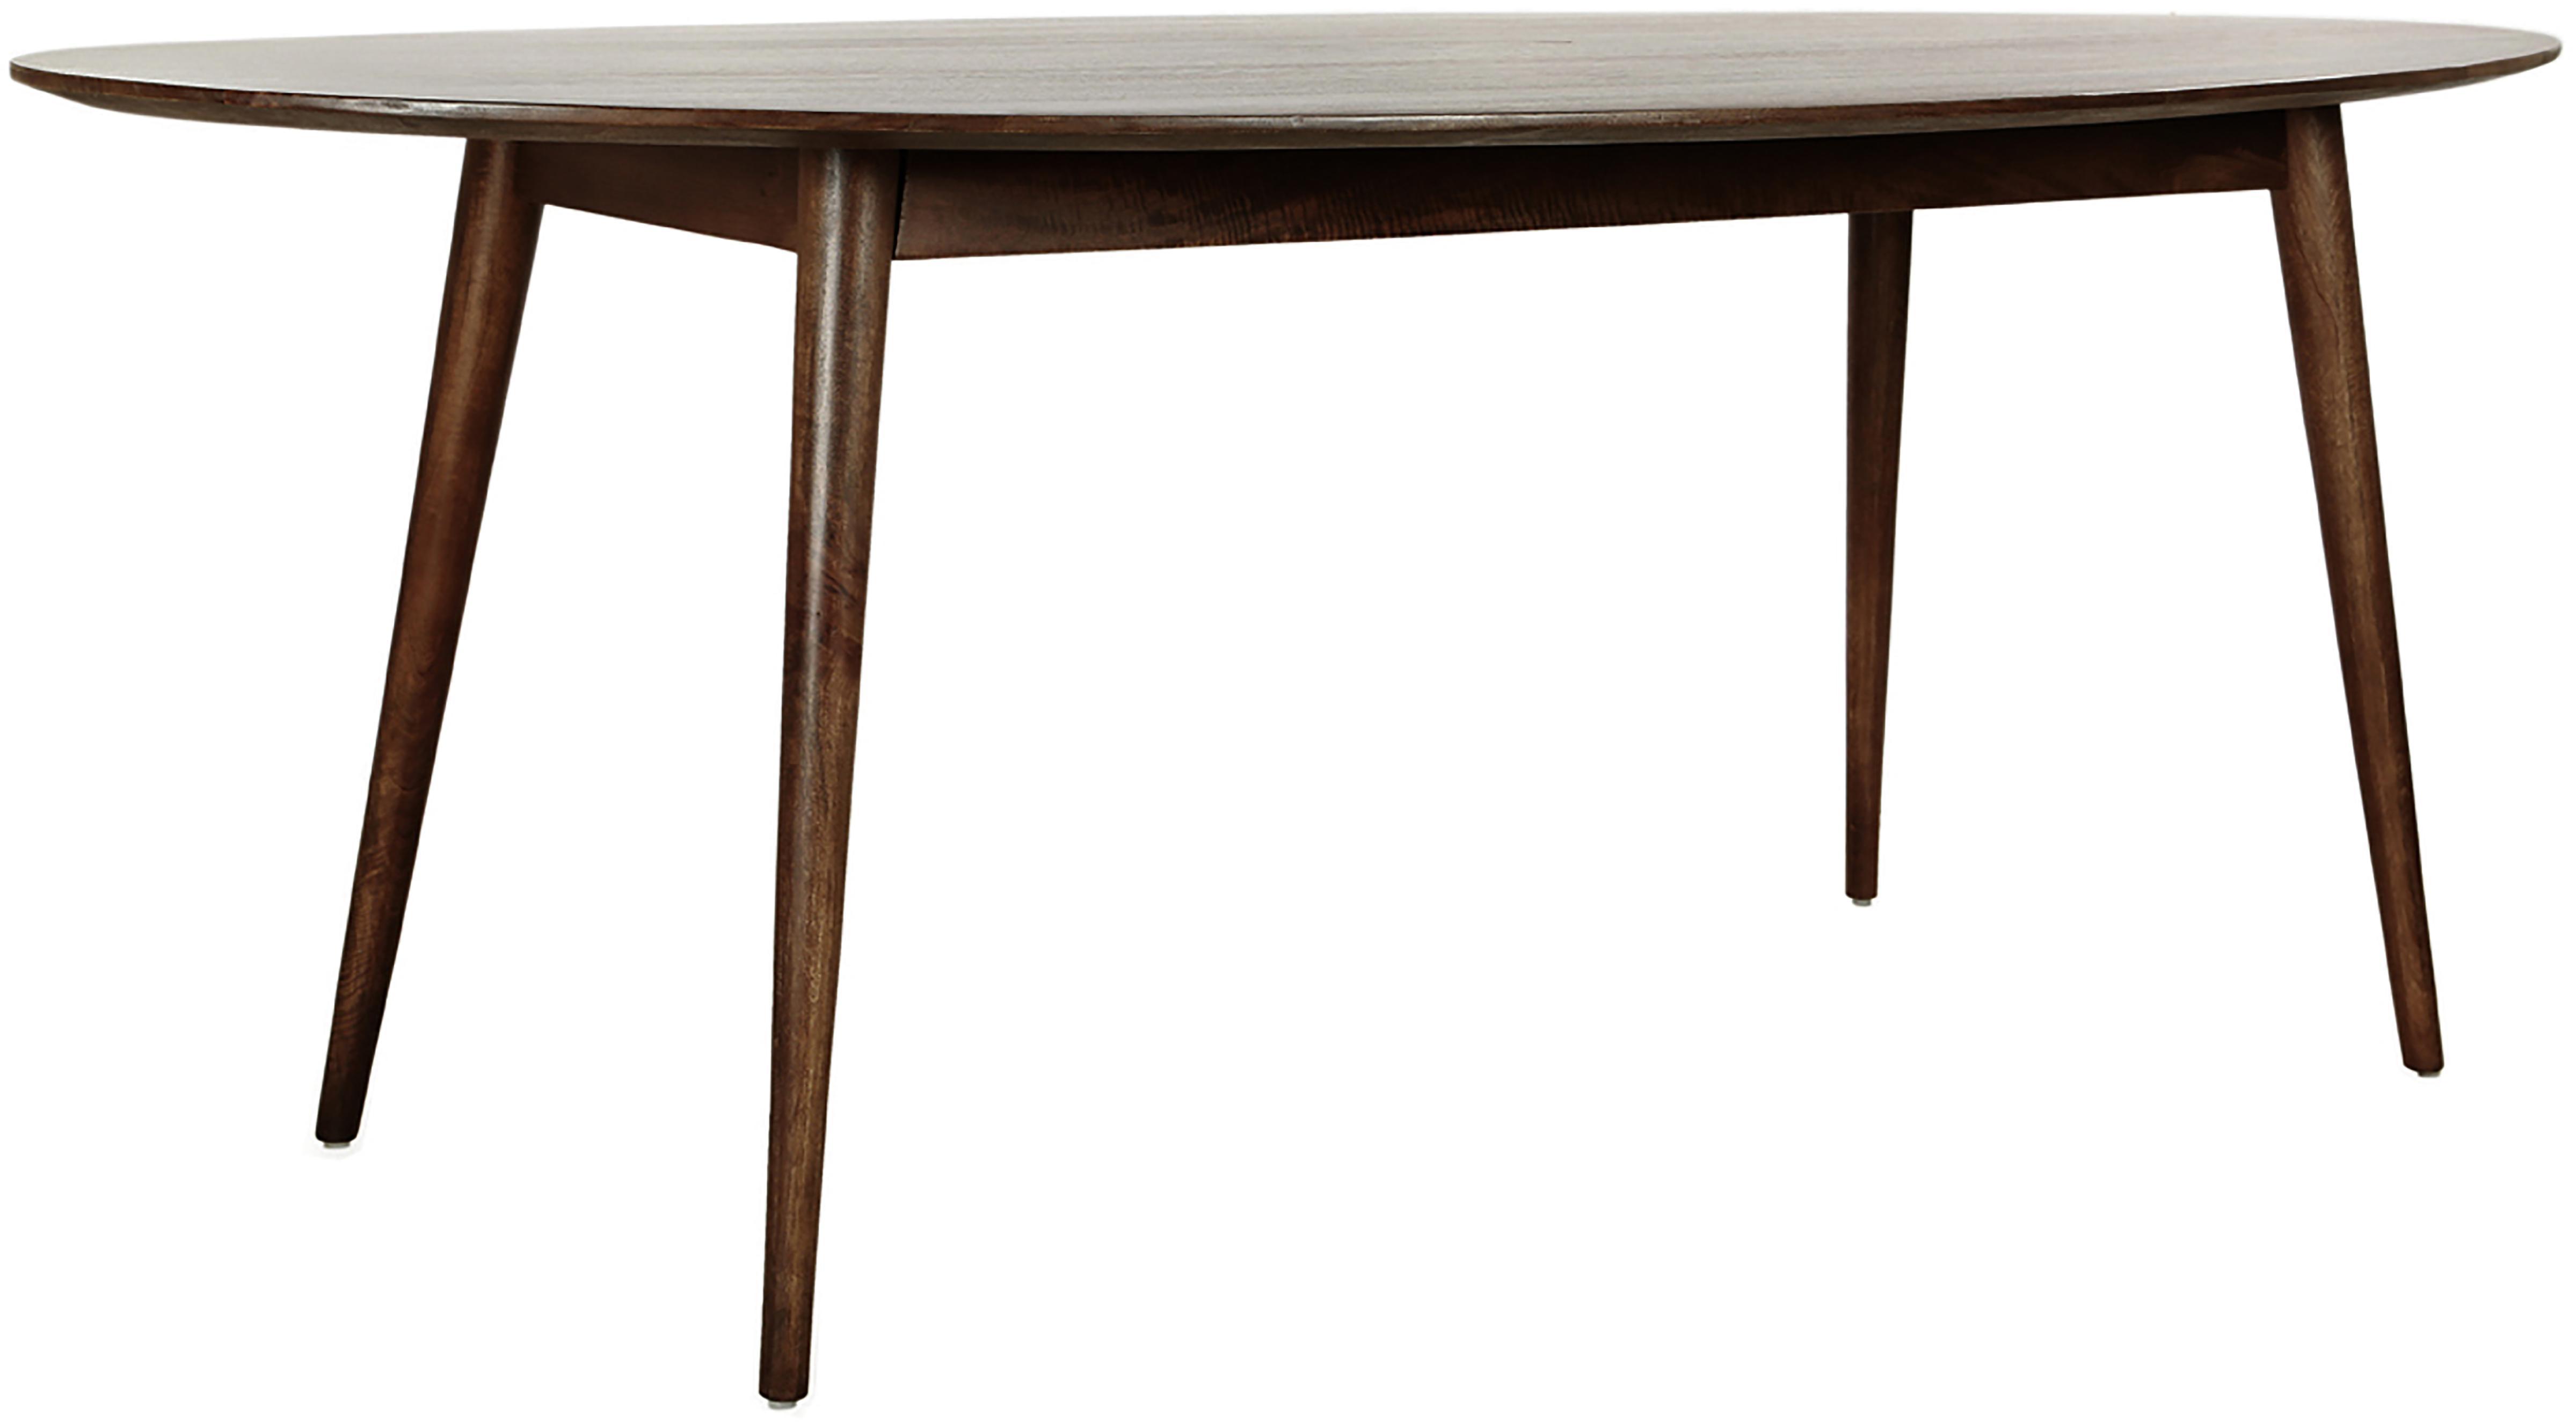 Ovaler Massivholz Esstisch Oscar, Mangoholz massiv, lackiert, Dunkelbraun, B 203 x T 97 cm